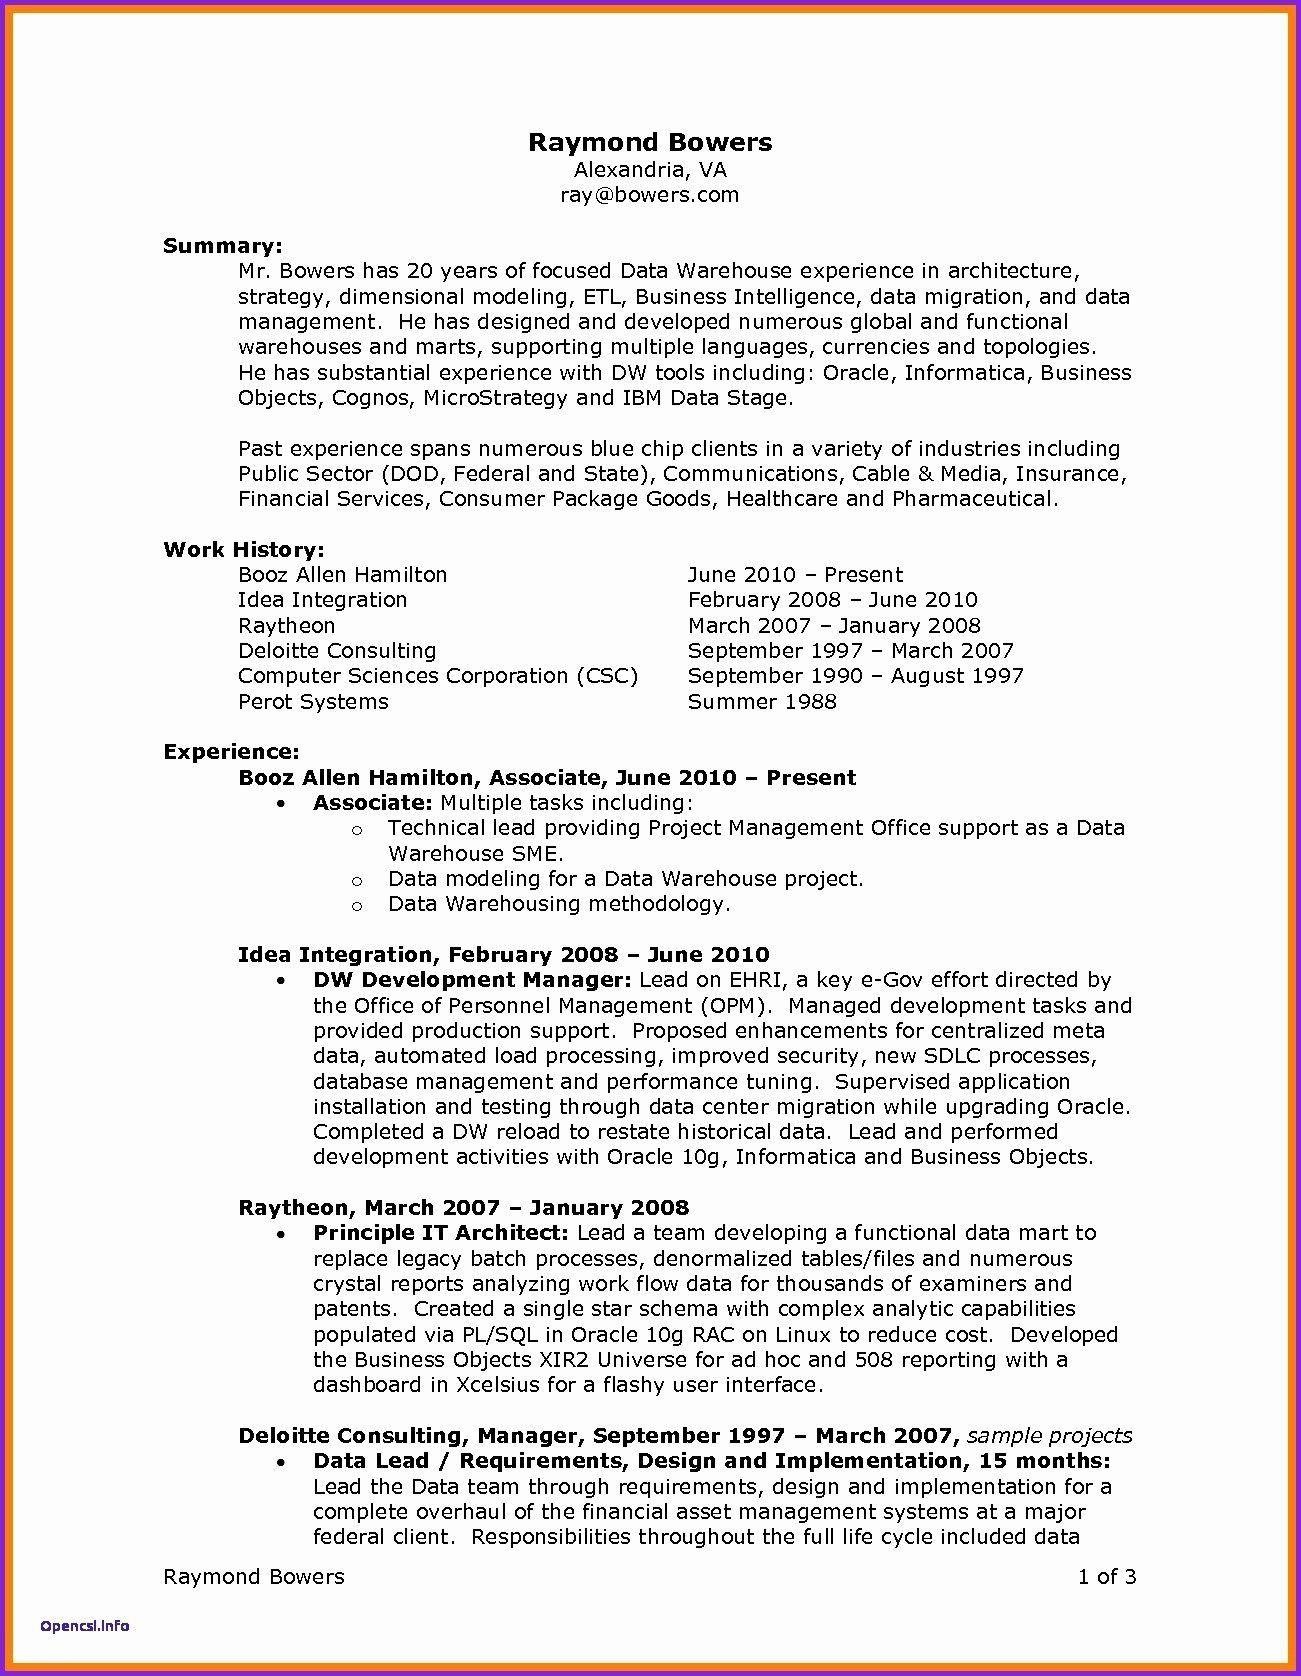 Best Of Ecosystem Worksheet Ecosystemworksheet